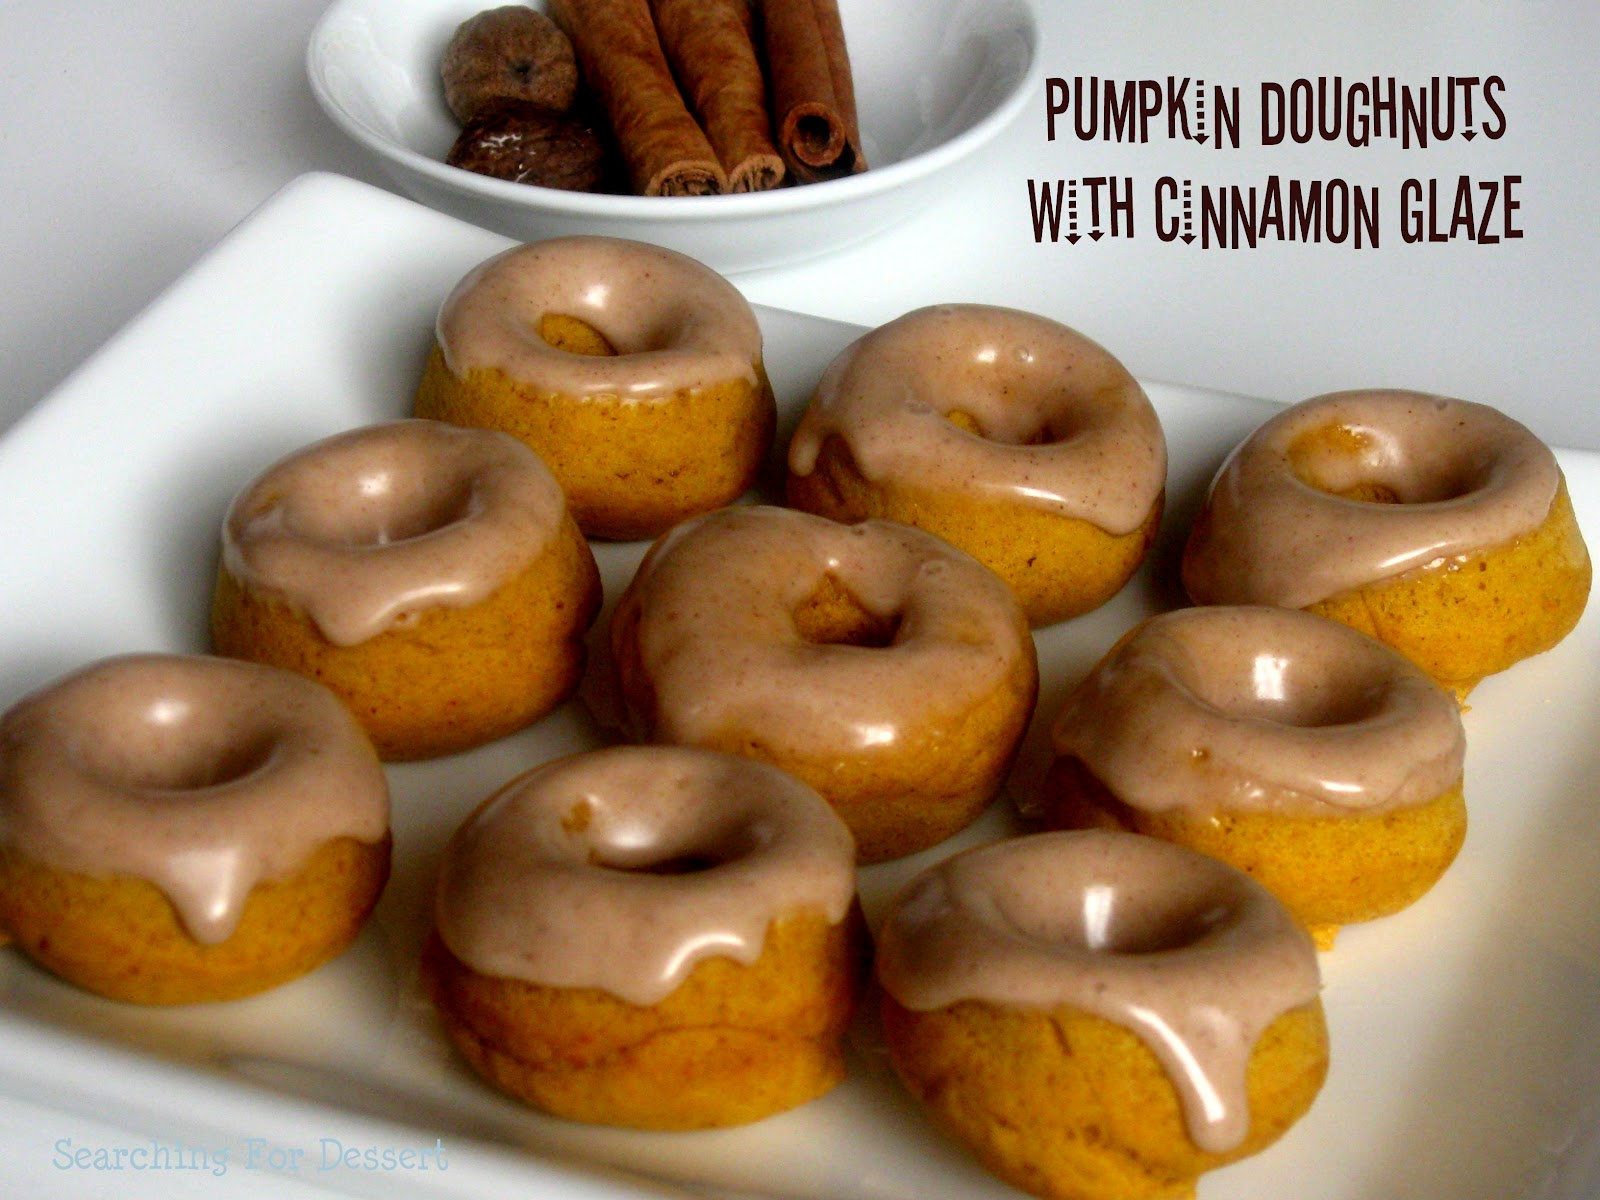 ... baked pumpkin pie oatmeal cake baked in a pumpkin baked pumpkin donuts